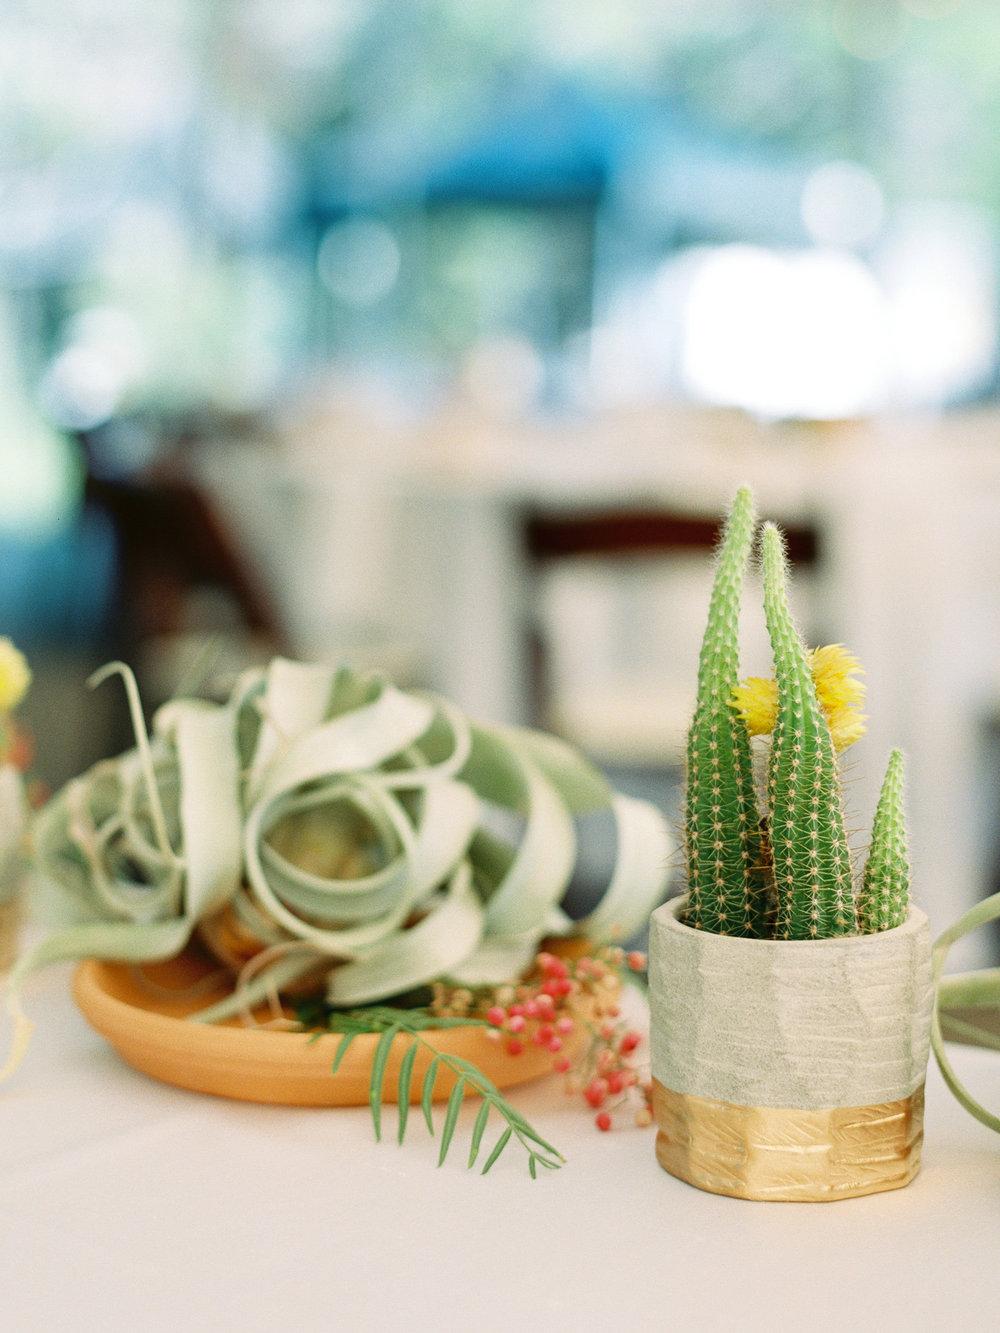 Best-Austin-Denver-California-Wedding-Photographer-Greenhouse-Driftwood7.jpg